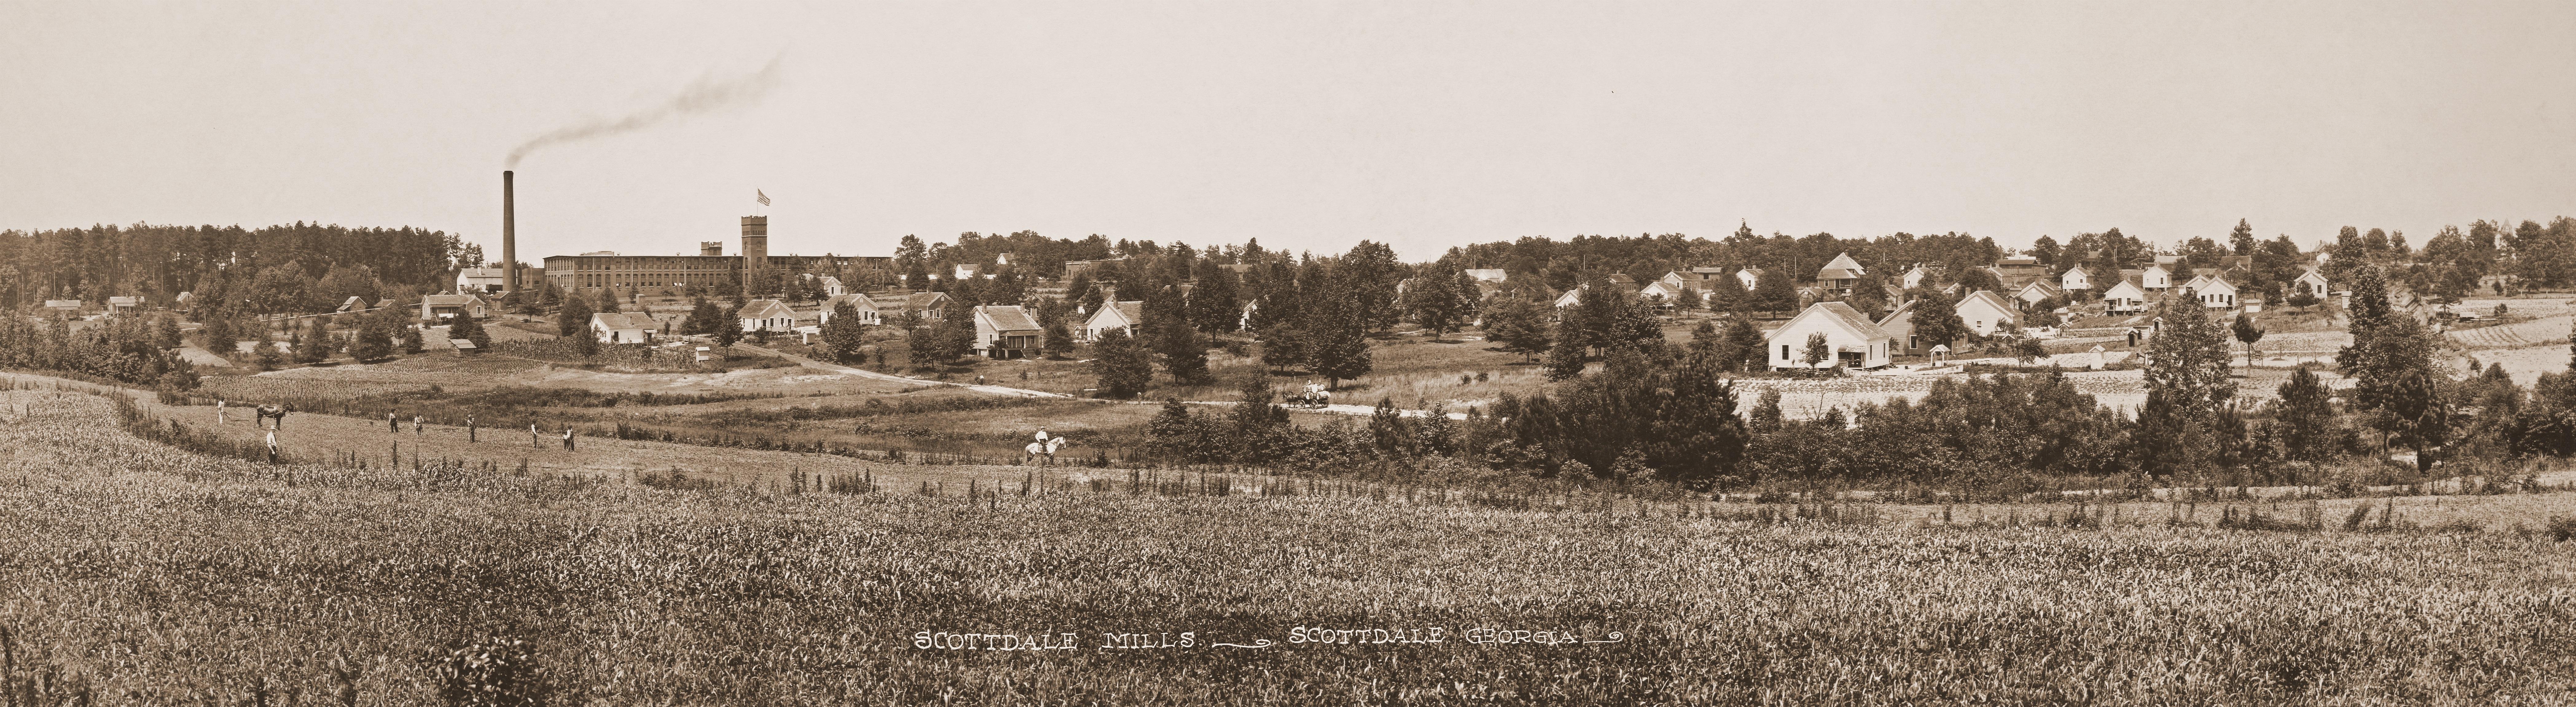 scottdale mills panaromic